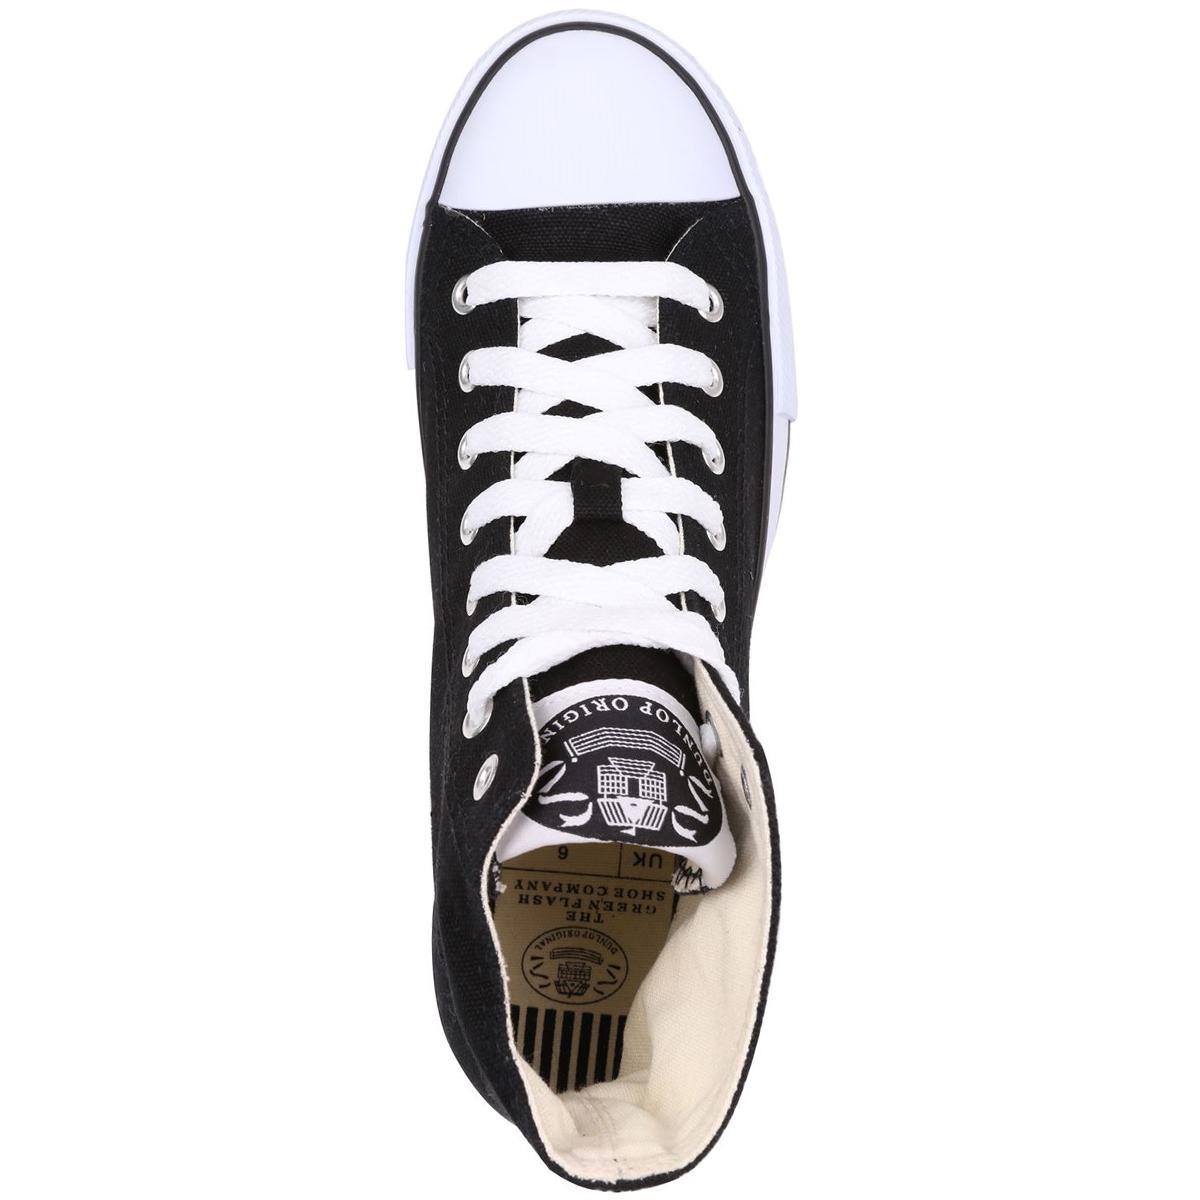 DUNLOP Men's Canvas High-Top Sneakers